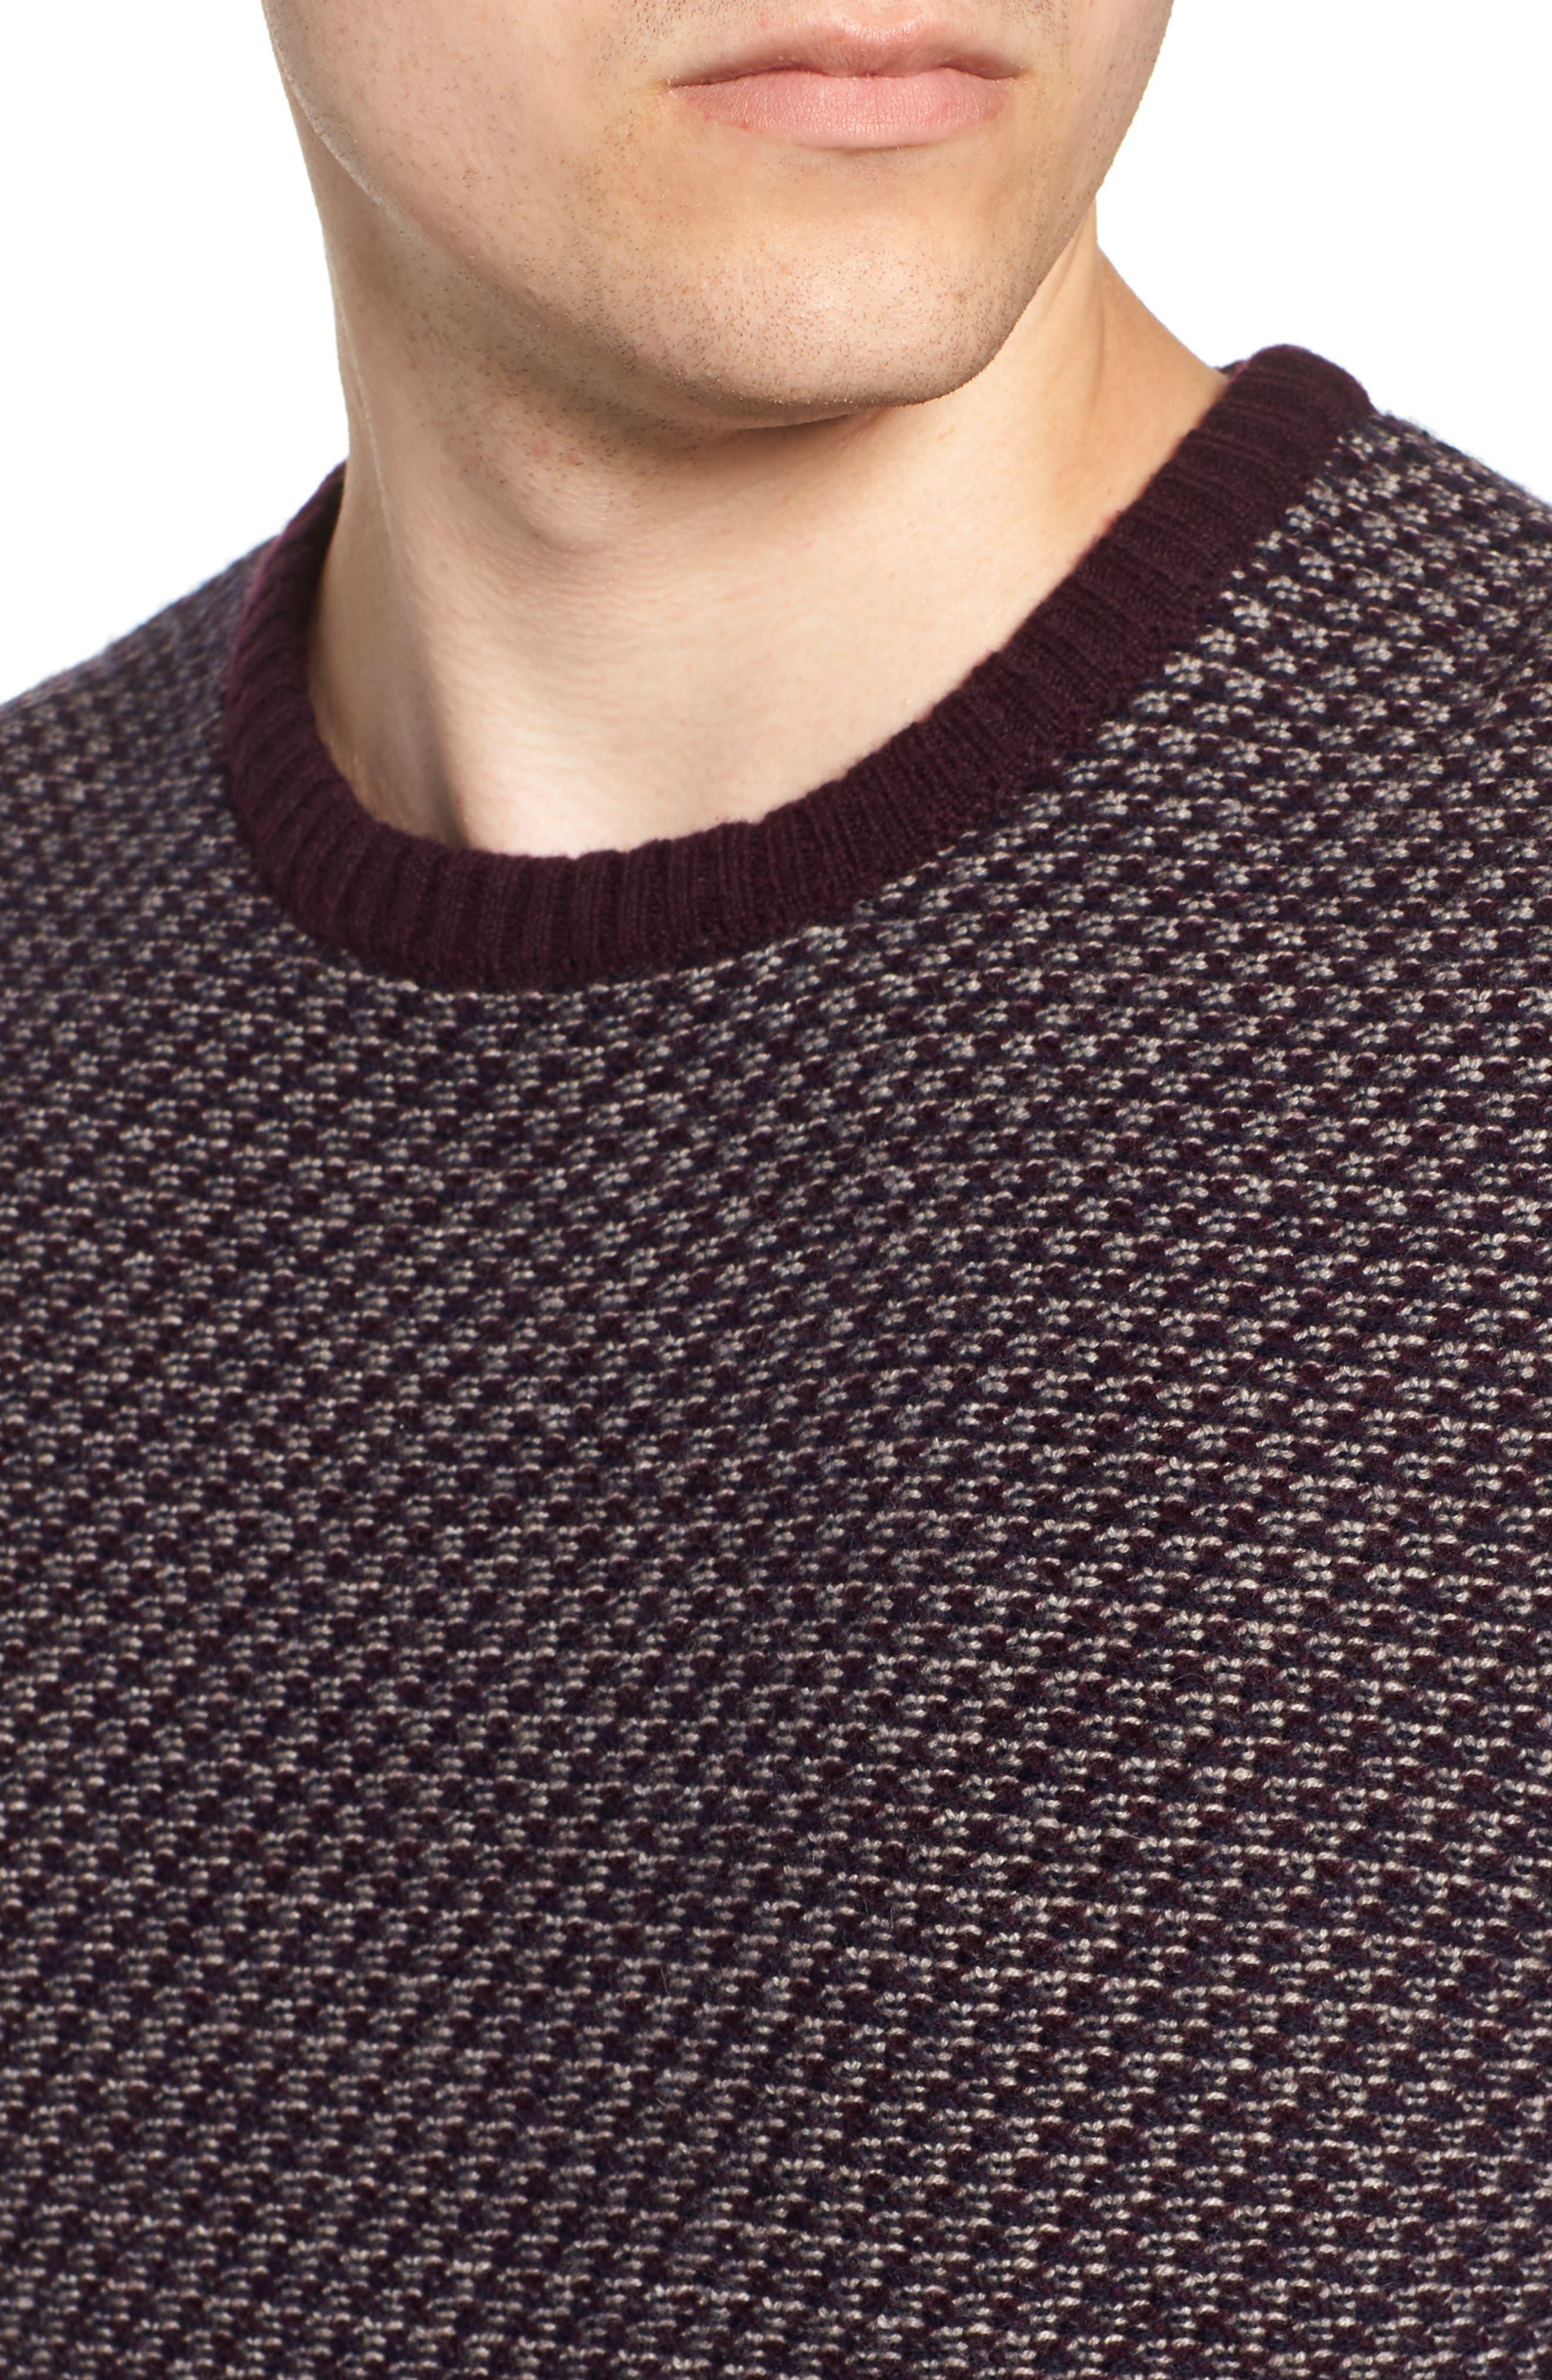 Jacquard Wool & Cashmere Sweater,                             Alternate thumbnail 4, color,                             938